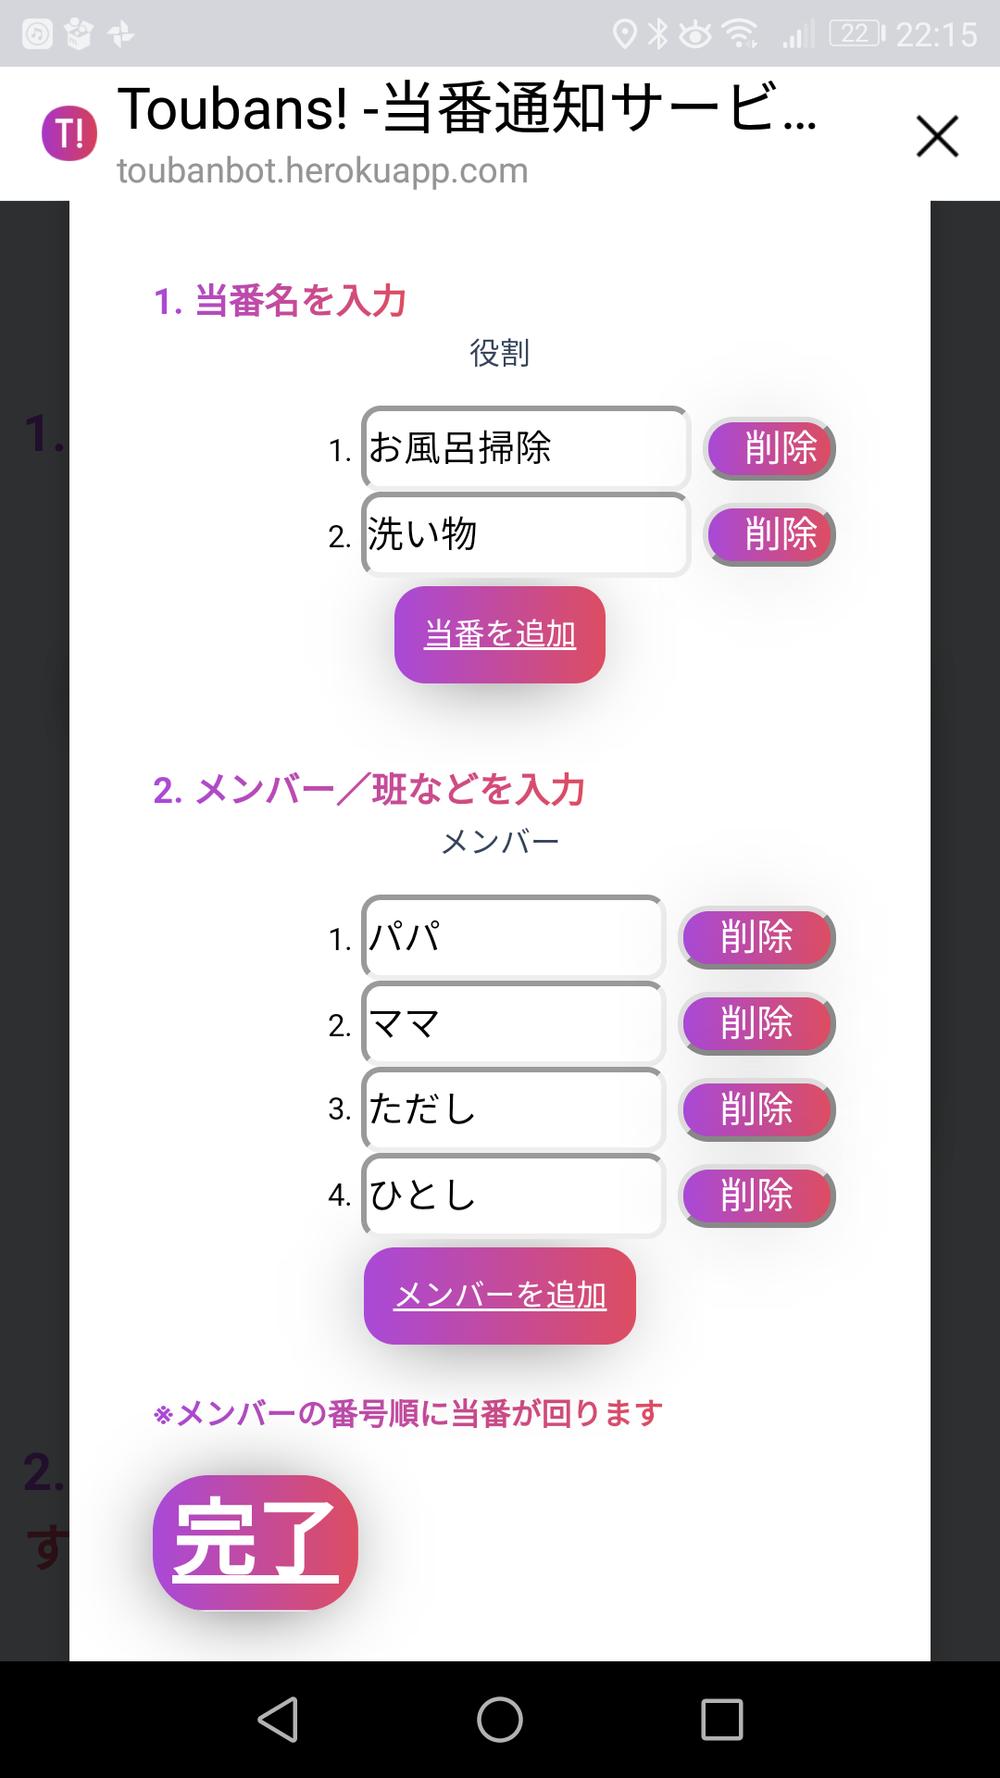 Screenshot_20181019-221547.png